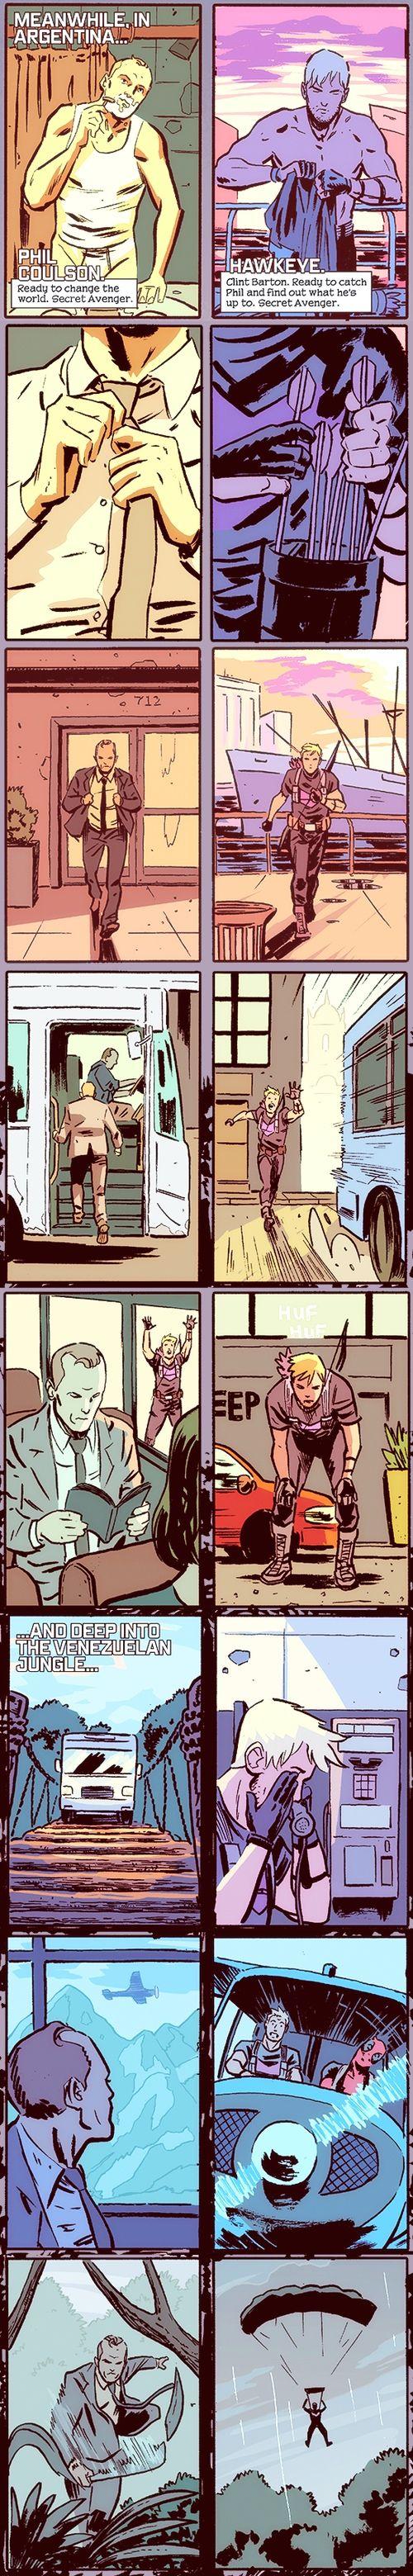 Phil Coulson, Hawkeye, Deadpool    Secret Avengers #10    art by Michael Walsh    500x3120    #comics